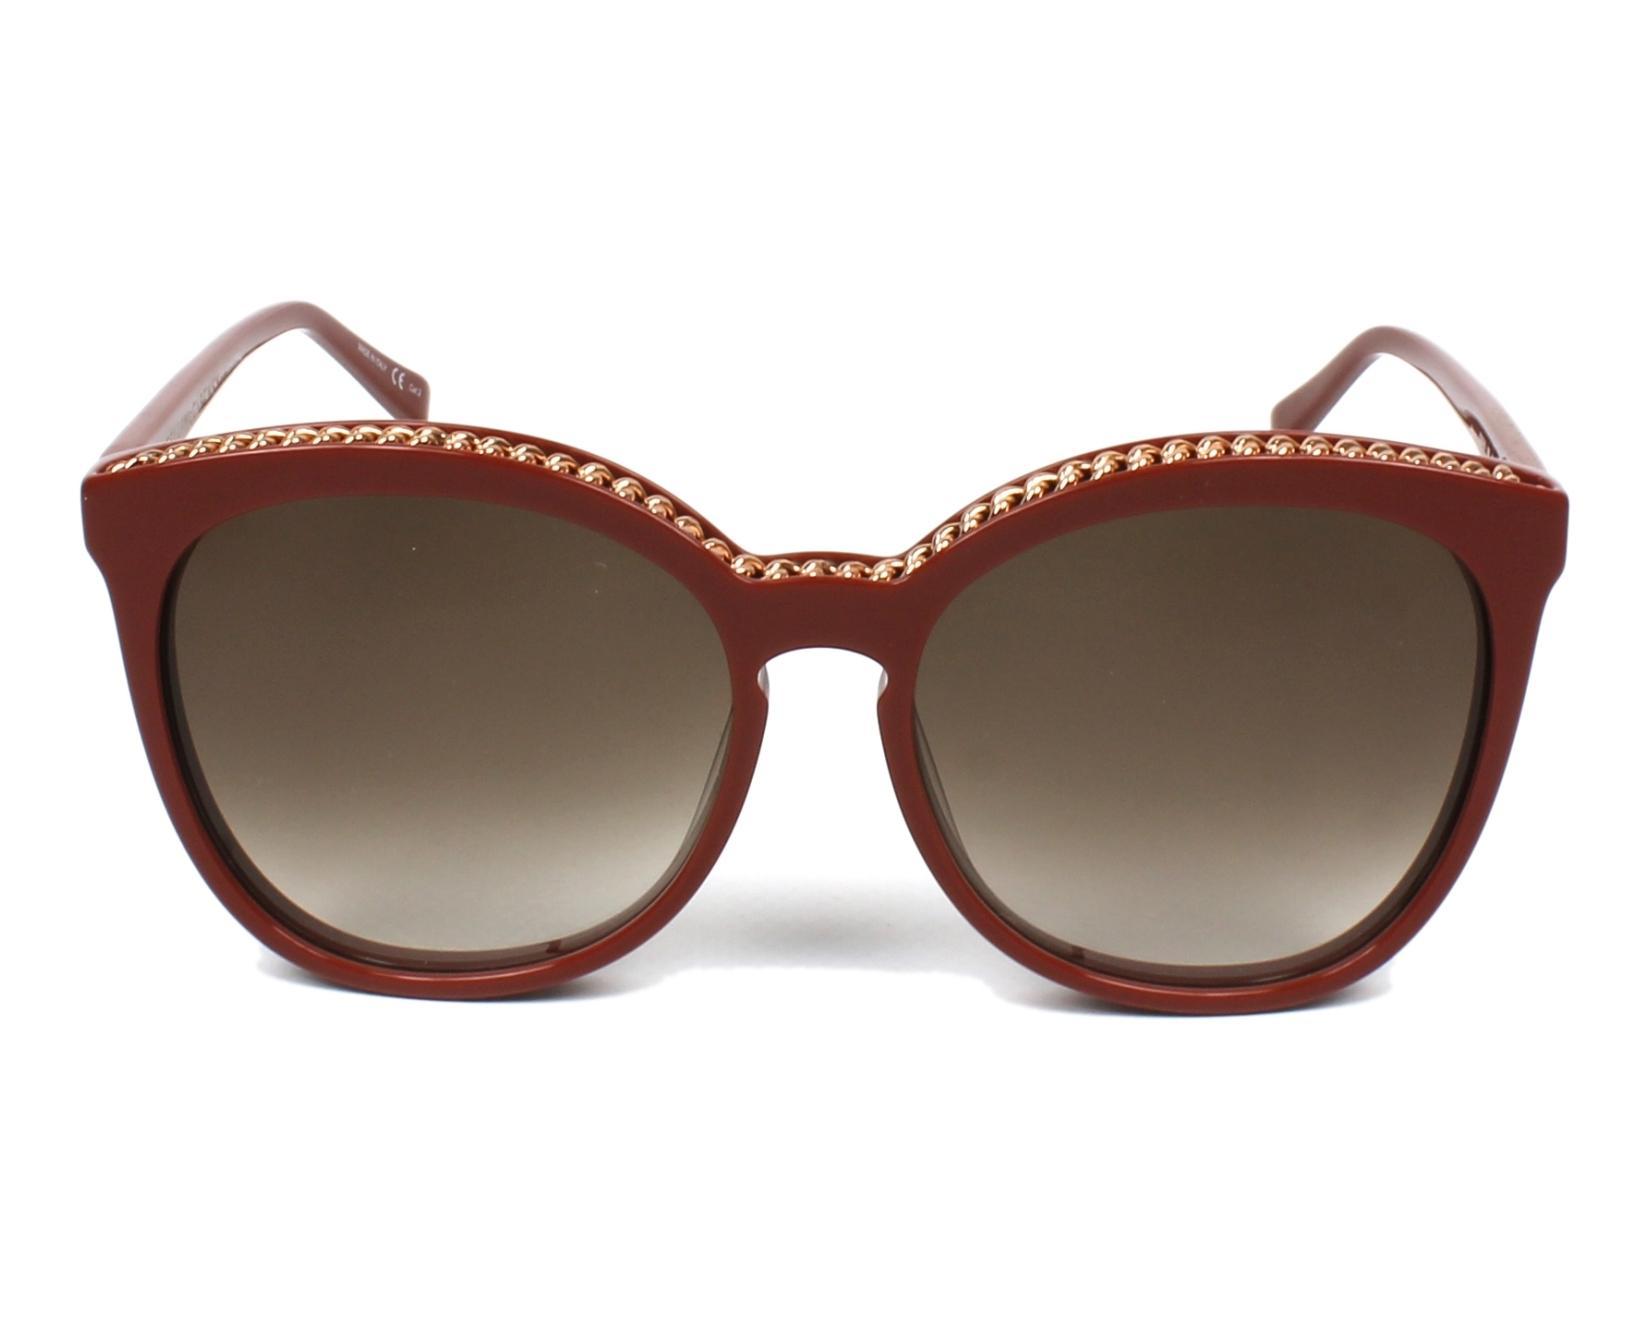 60c56b4cdb7 Sunglasses Stella McCartney SC-0074-S 005 - Red Gold Copper front view